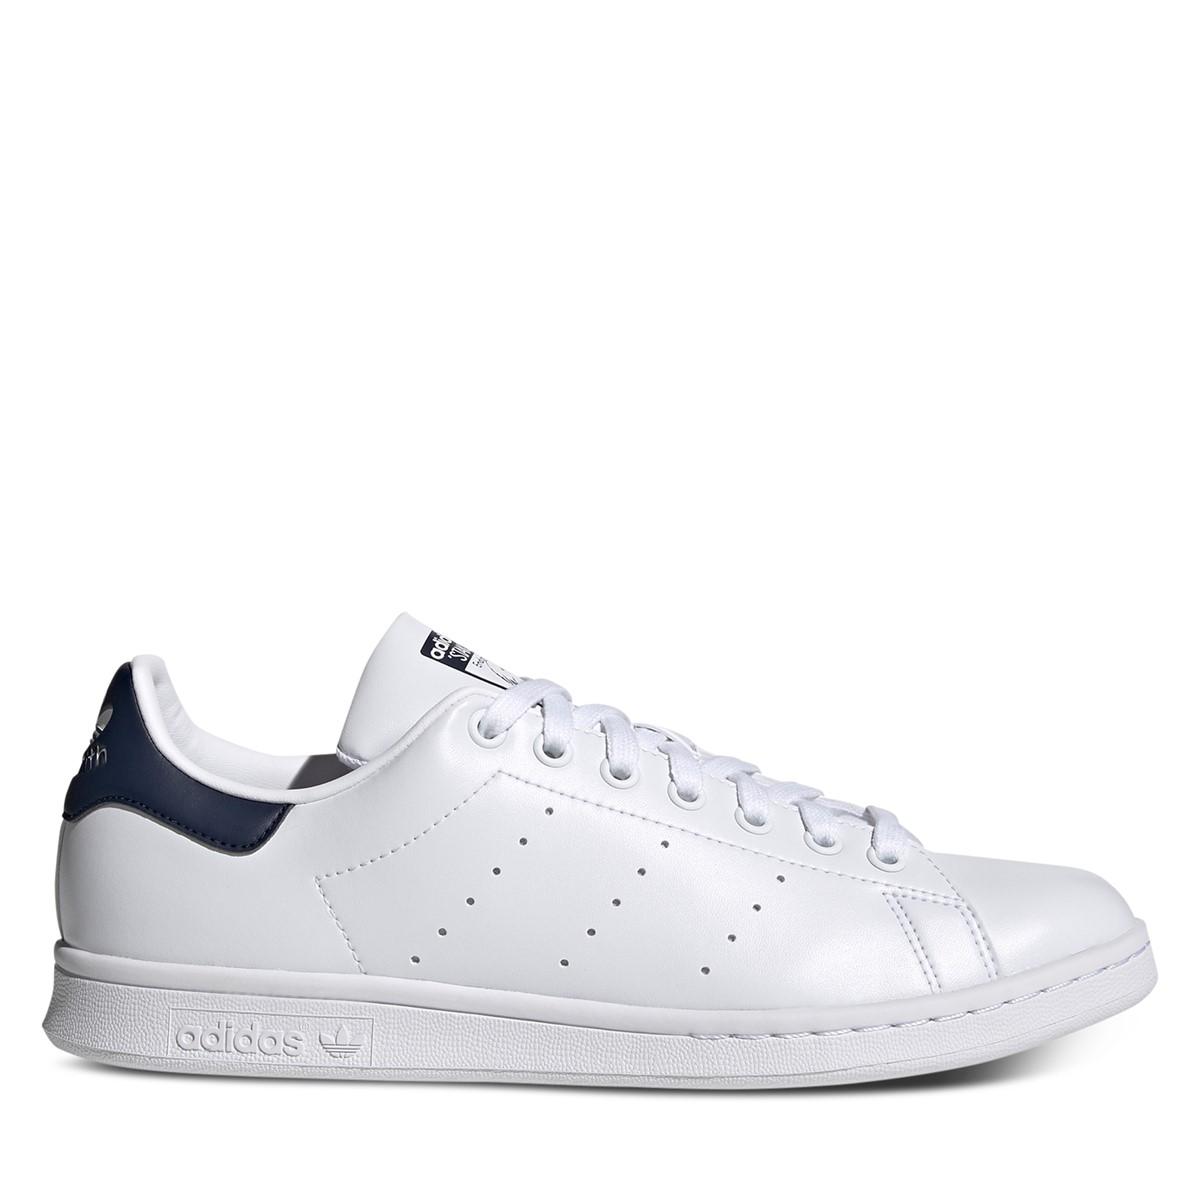 Men's Stan Smith Primegreen Sneakers in White/Navy Blue